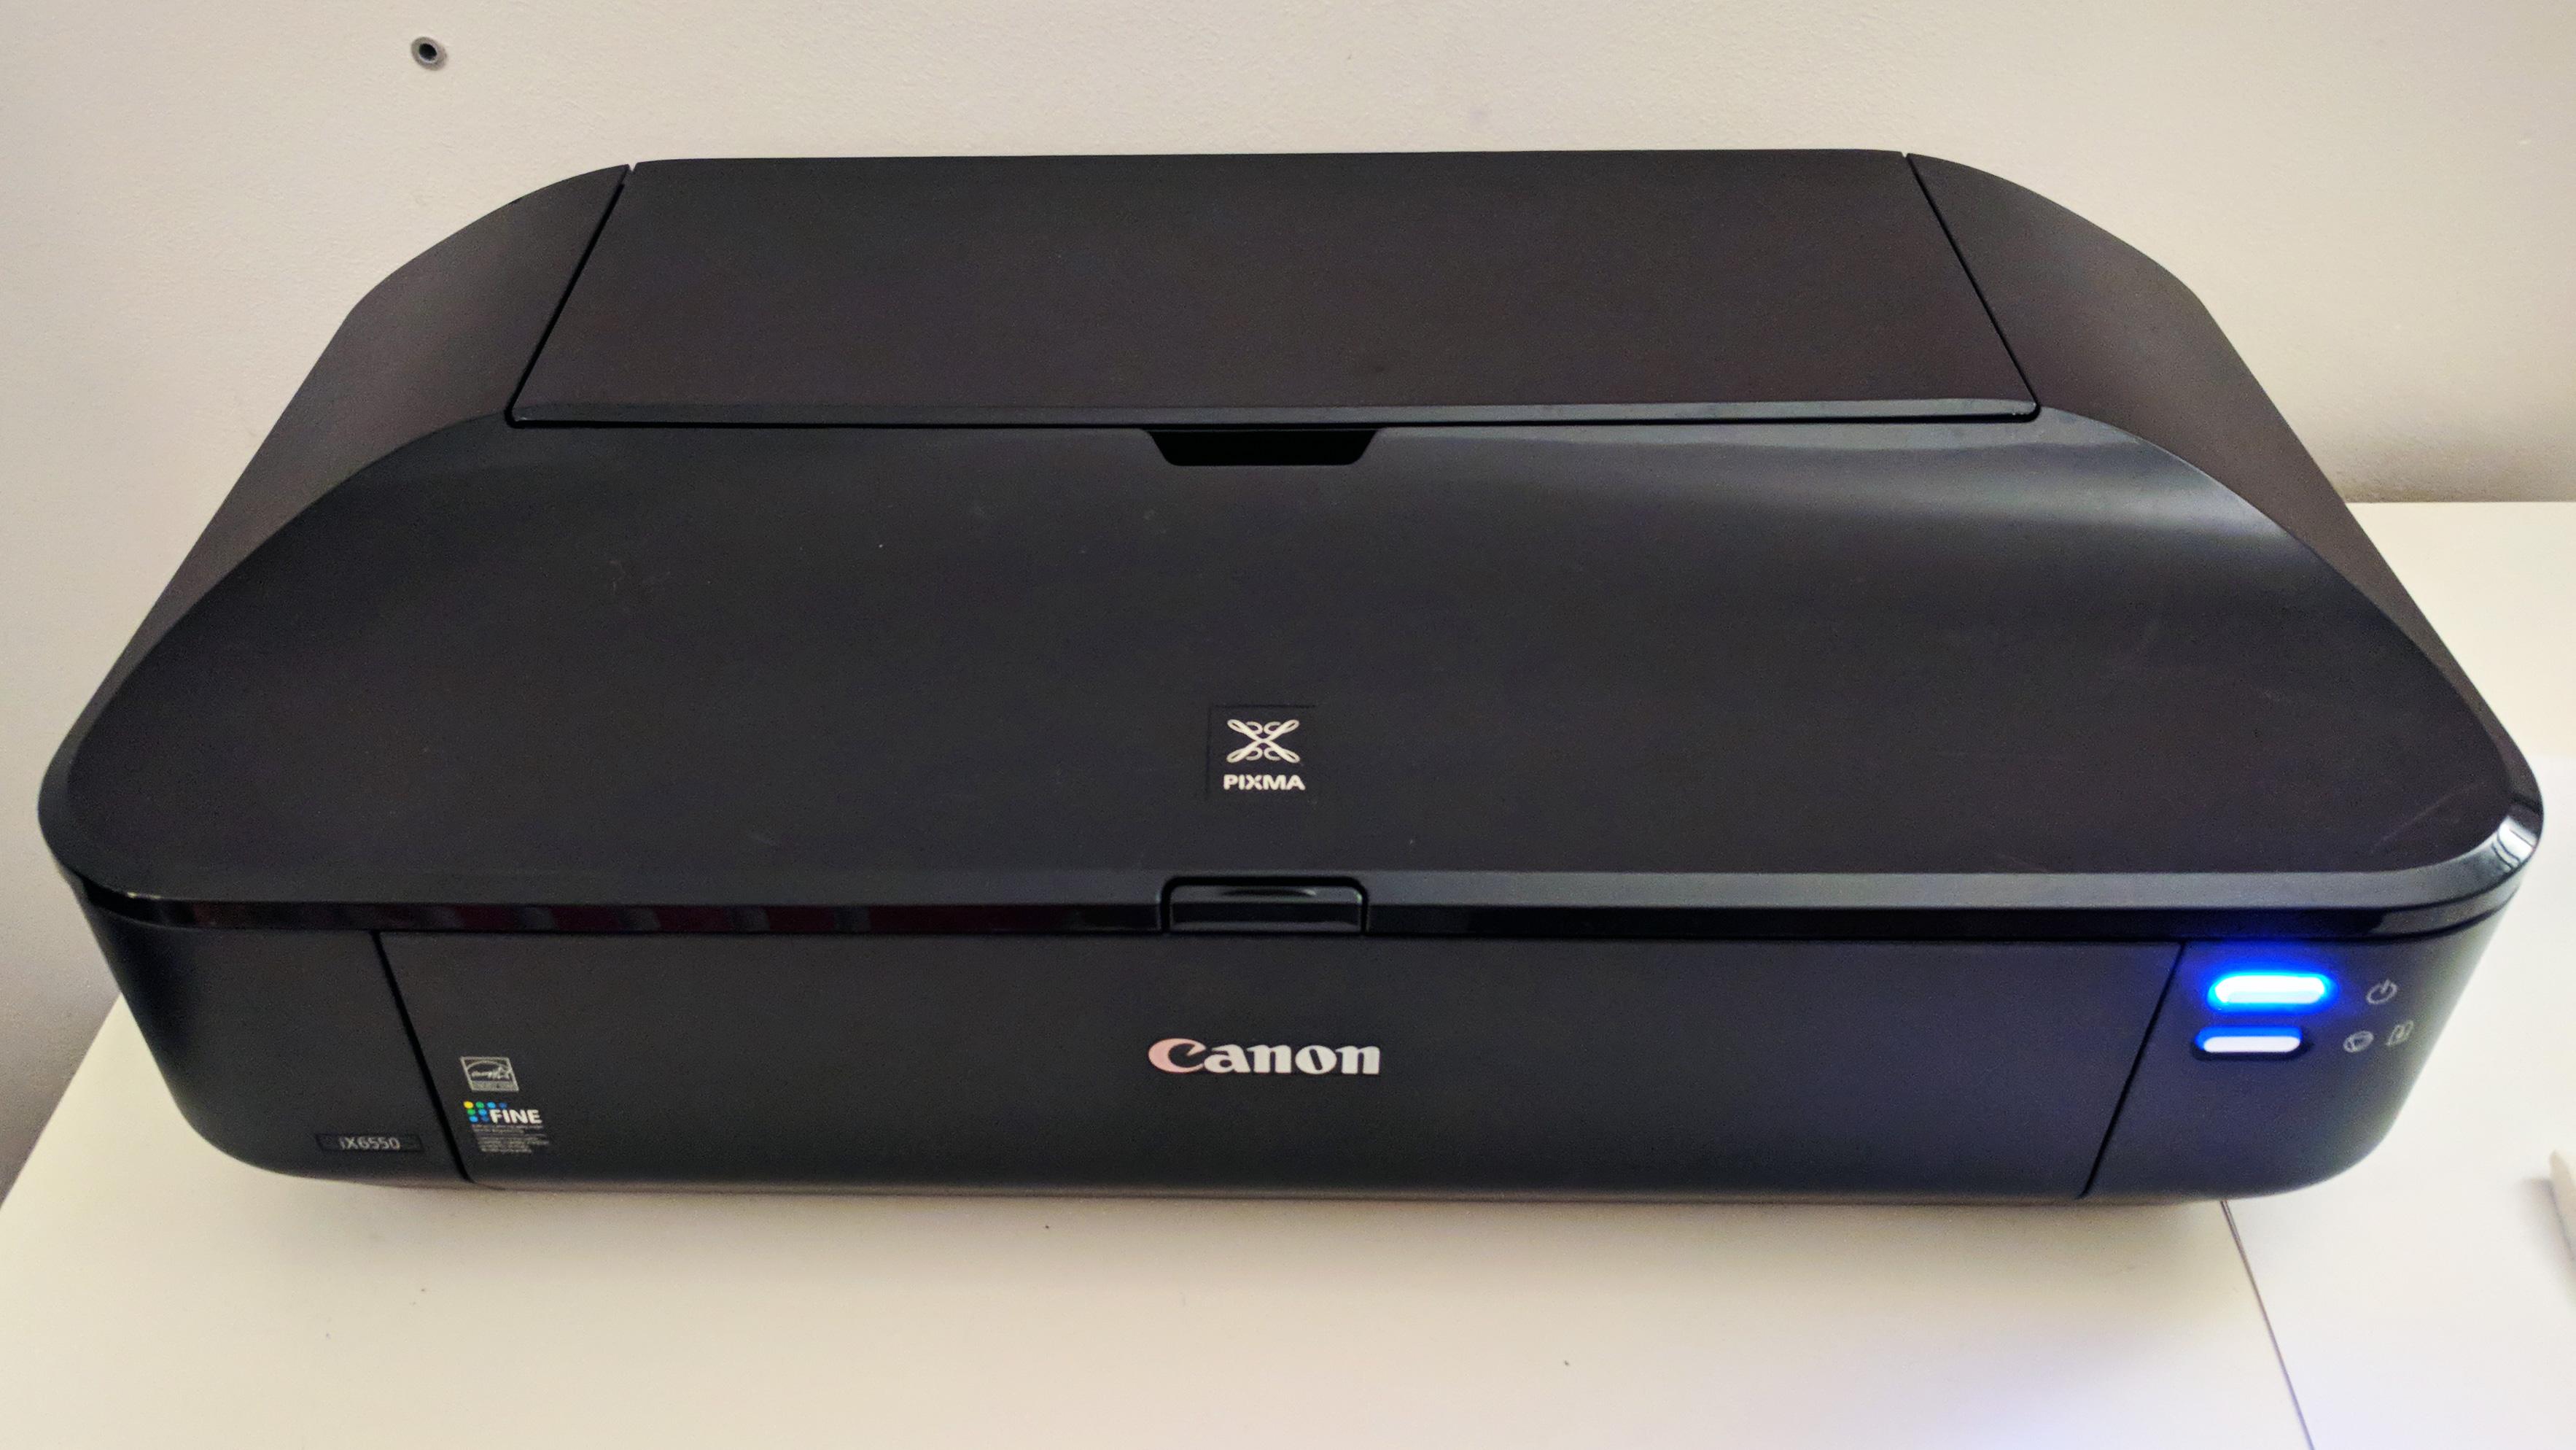 Picture of Open and Clean Canon Pixma IX6550 Printer